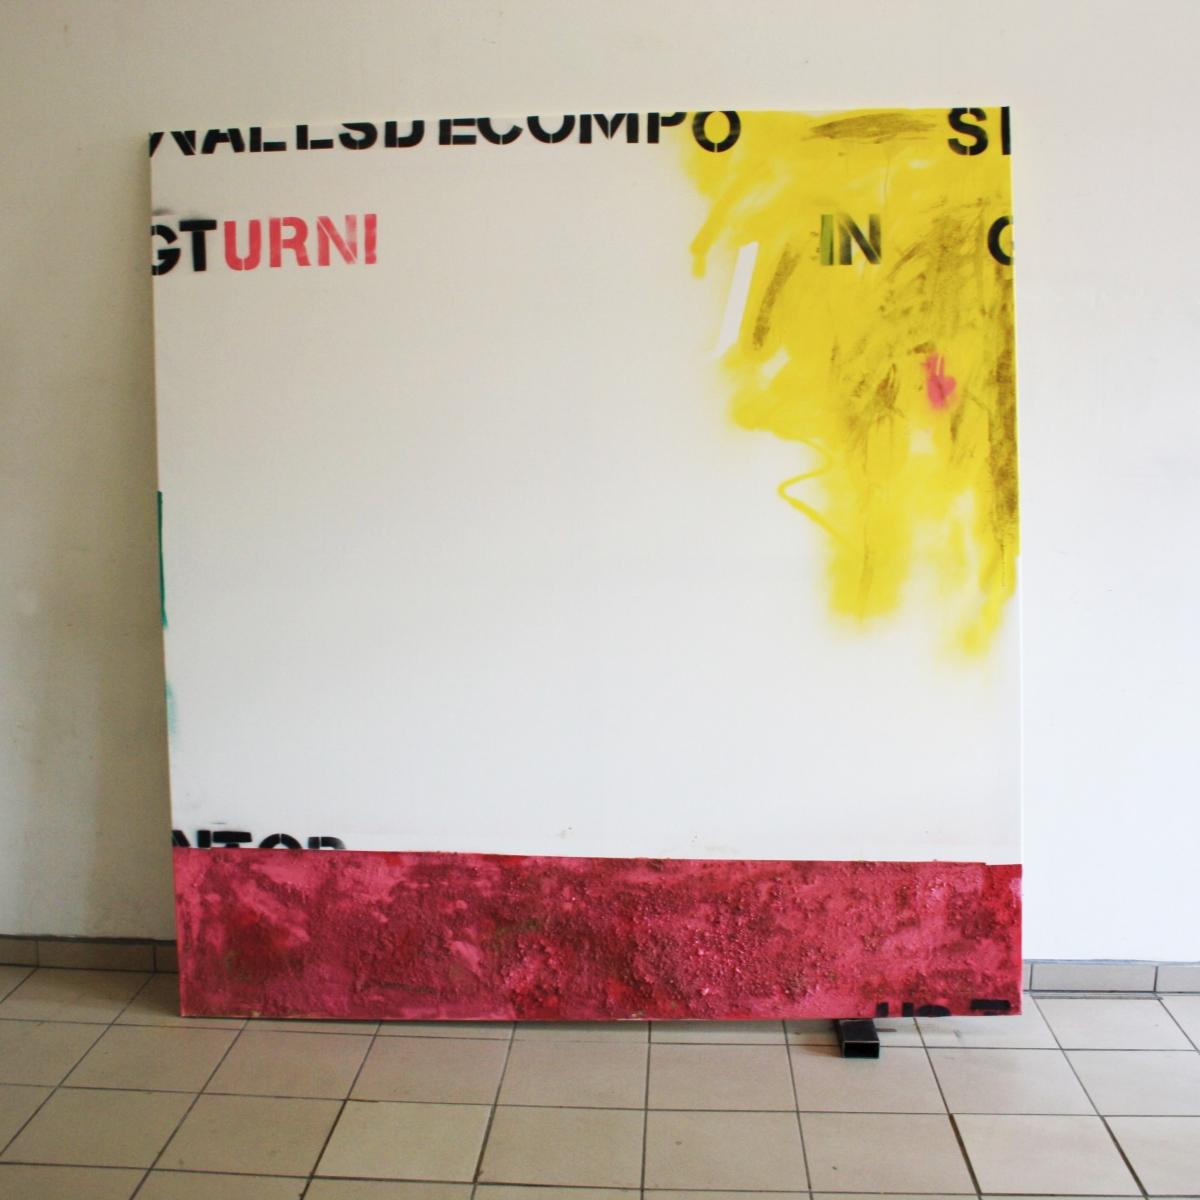 Anestis Ioannou_GTURNI_____ IN